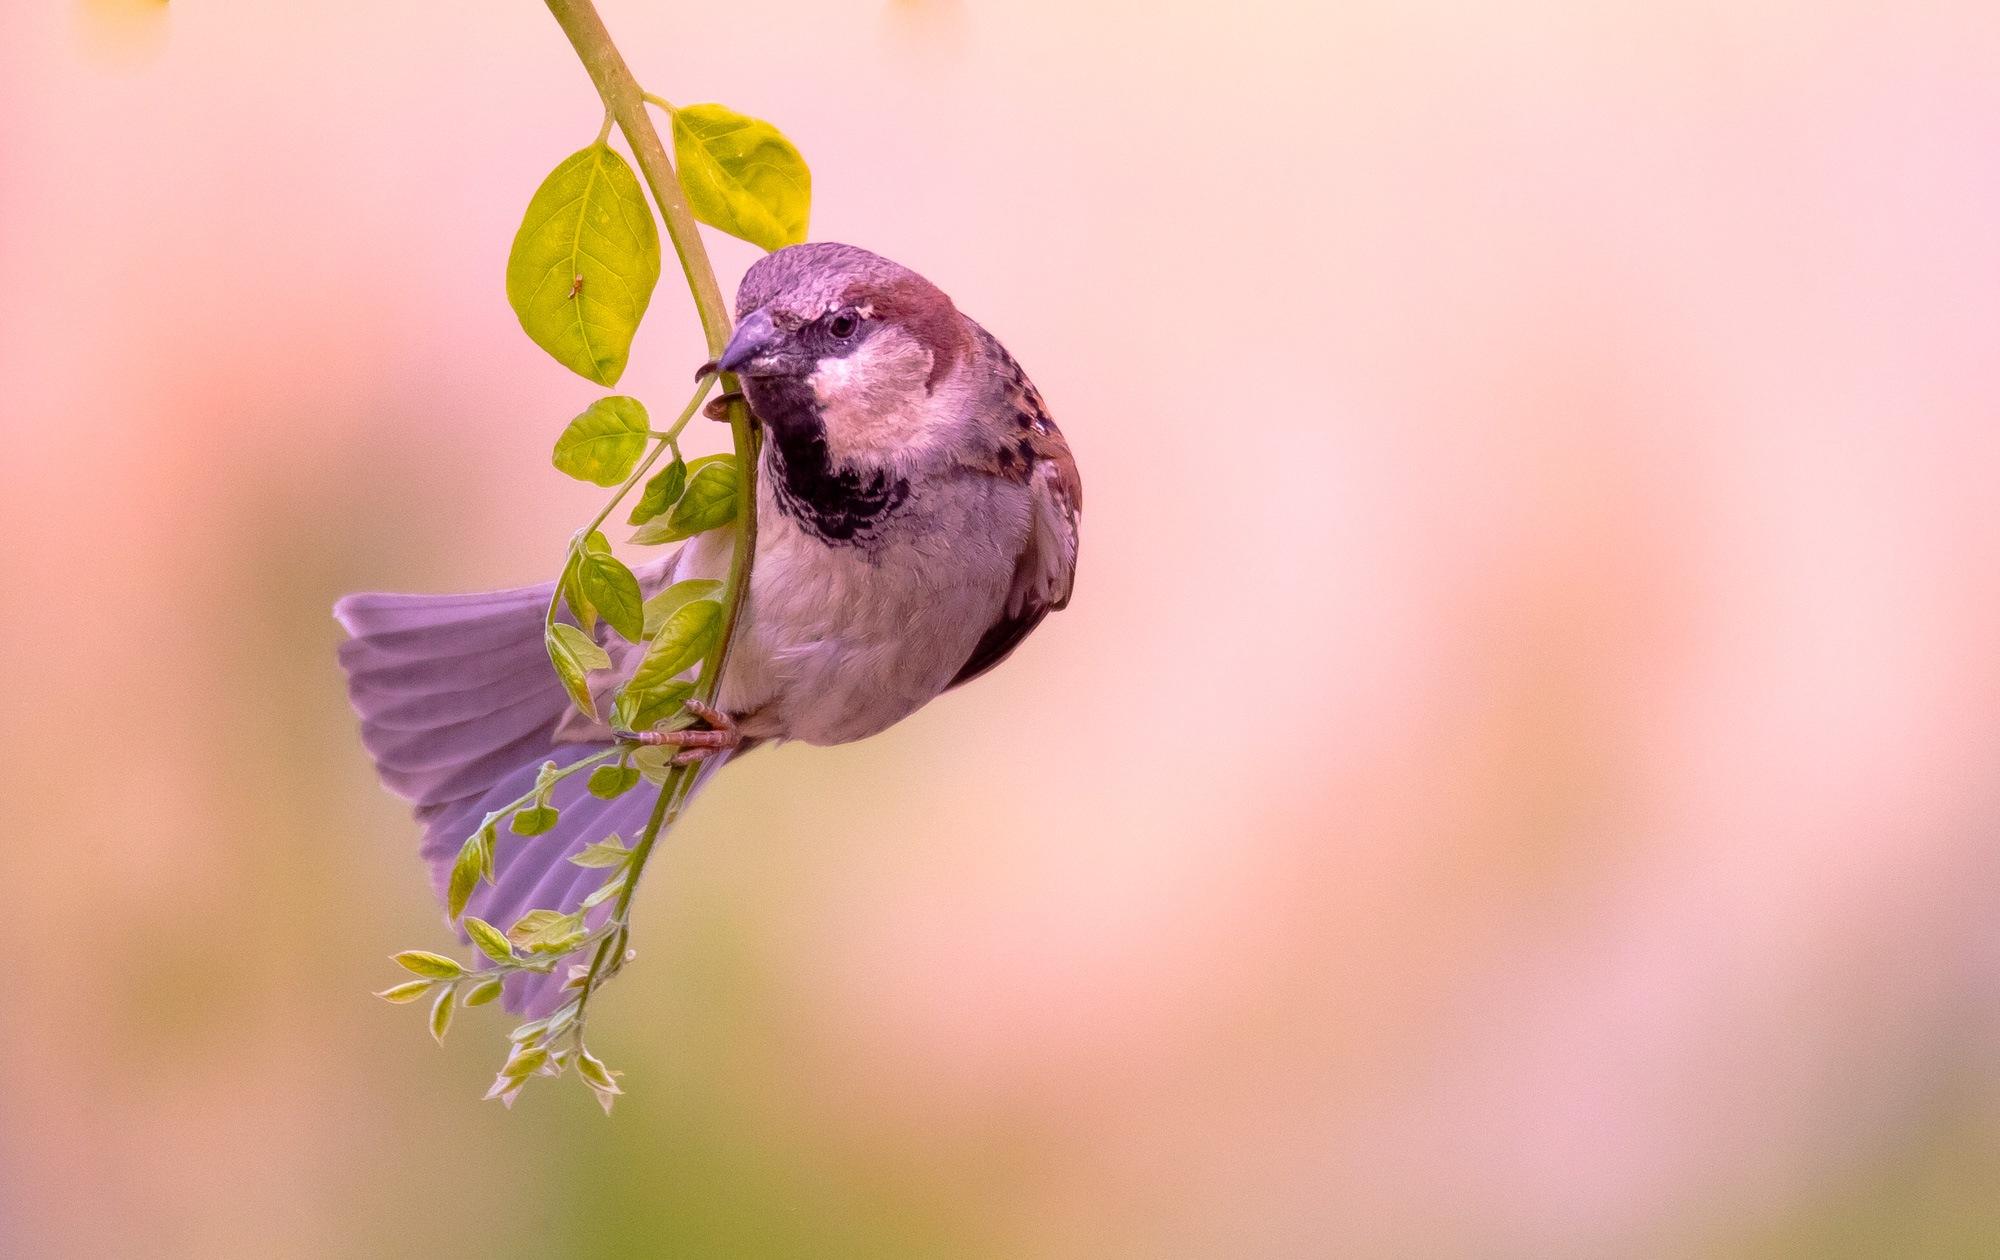 Sparrow by Lawrence Splitter